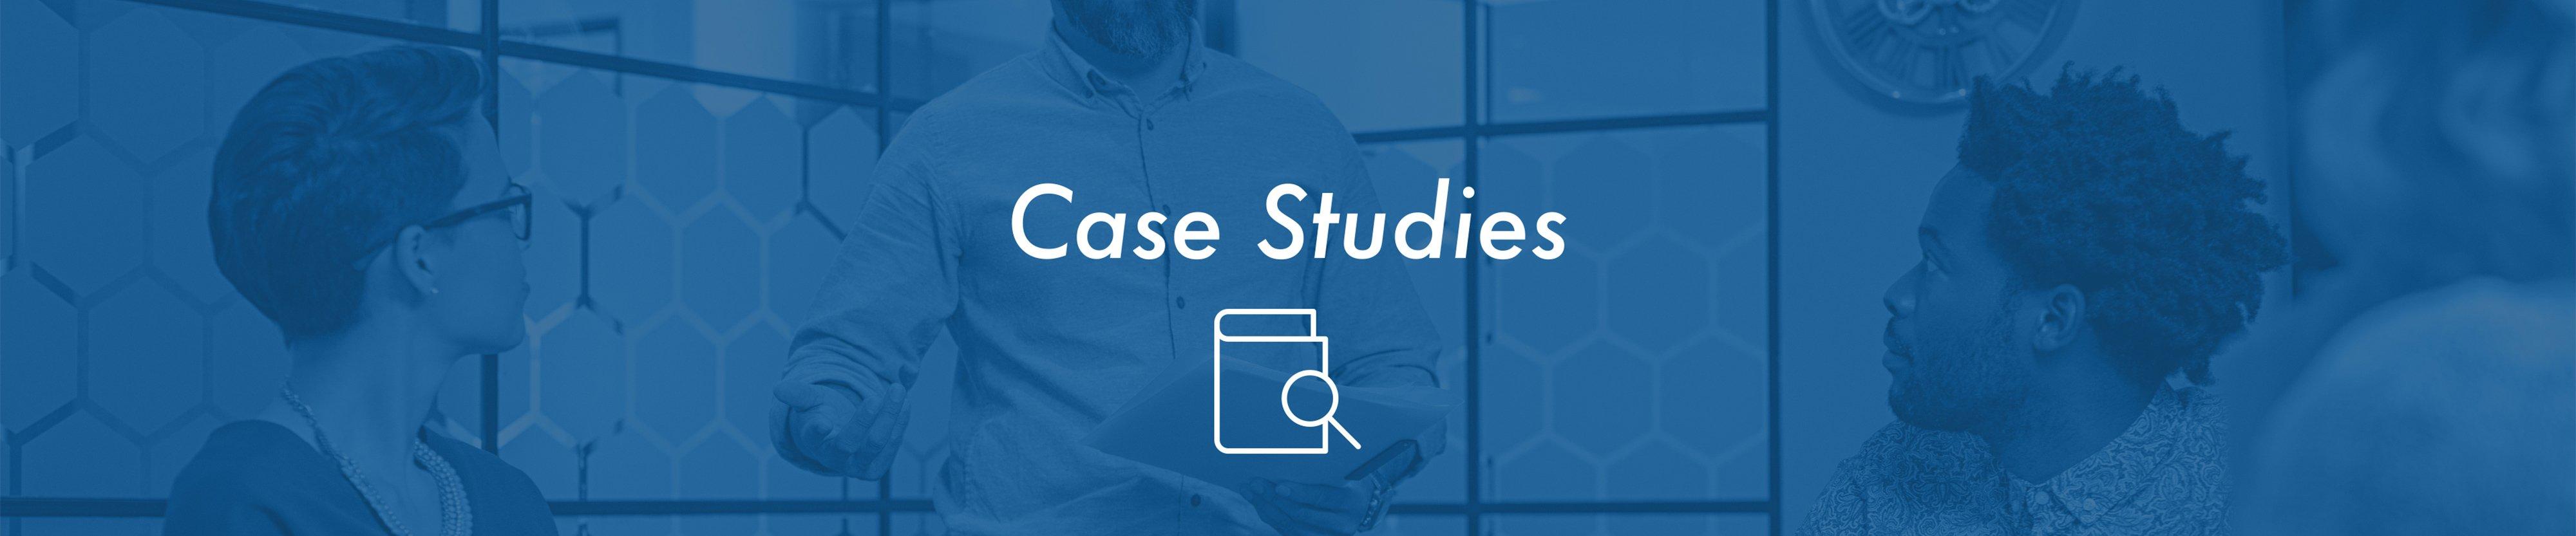 Advanced Analytics Group Case Studies